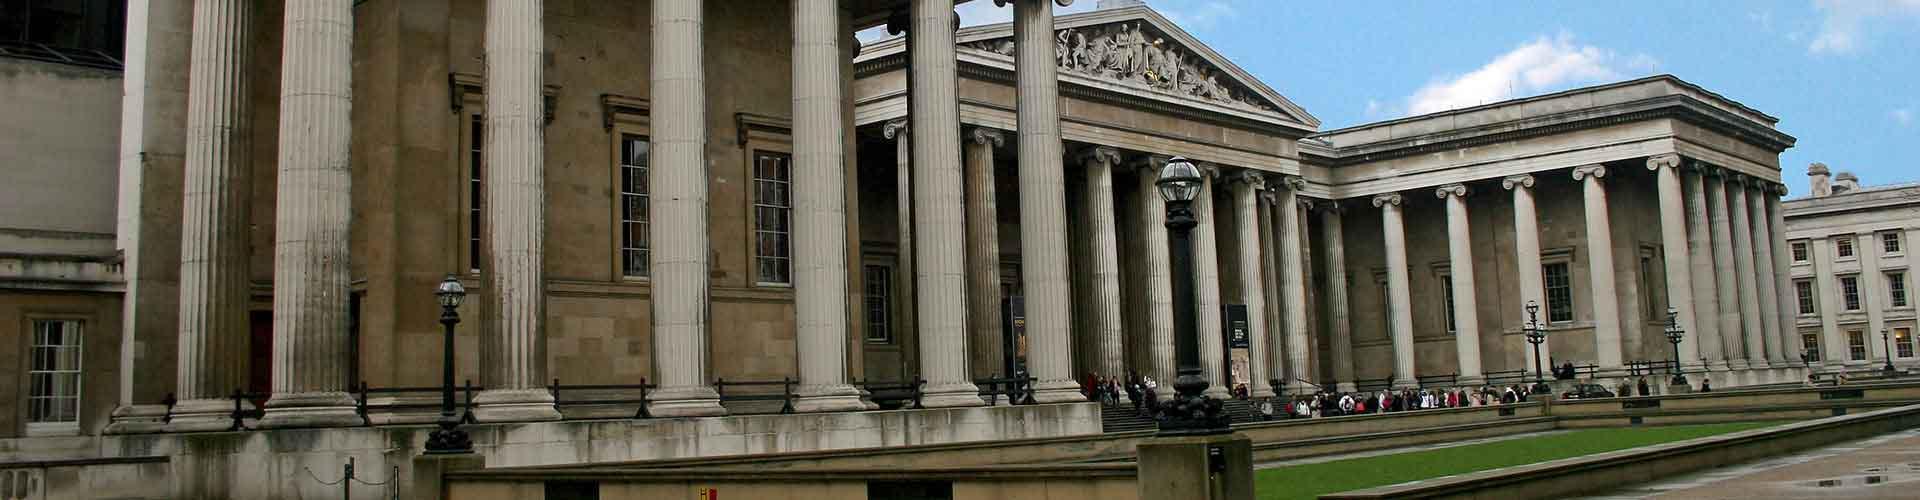 Londres - Albergues Juveniles cerca a British Museum. Mapas de Londres, Fotos y Comentarios para cada Albergue Juvenil en Londres.